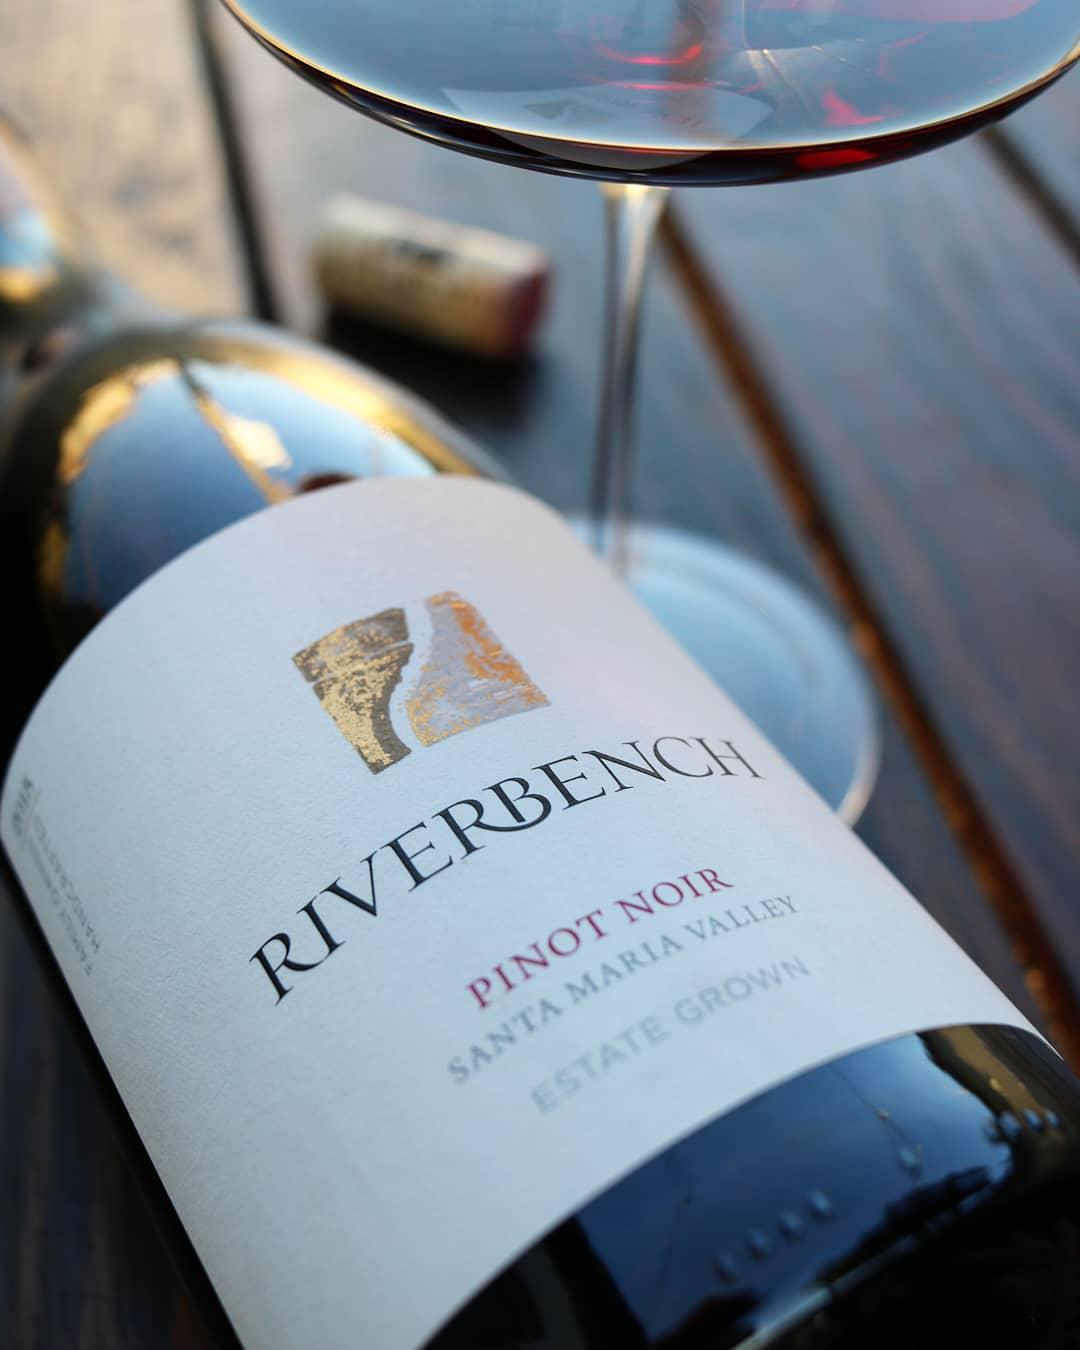 Riverbench Pinot Noir.jpg